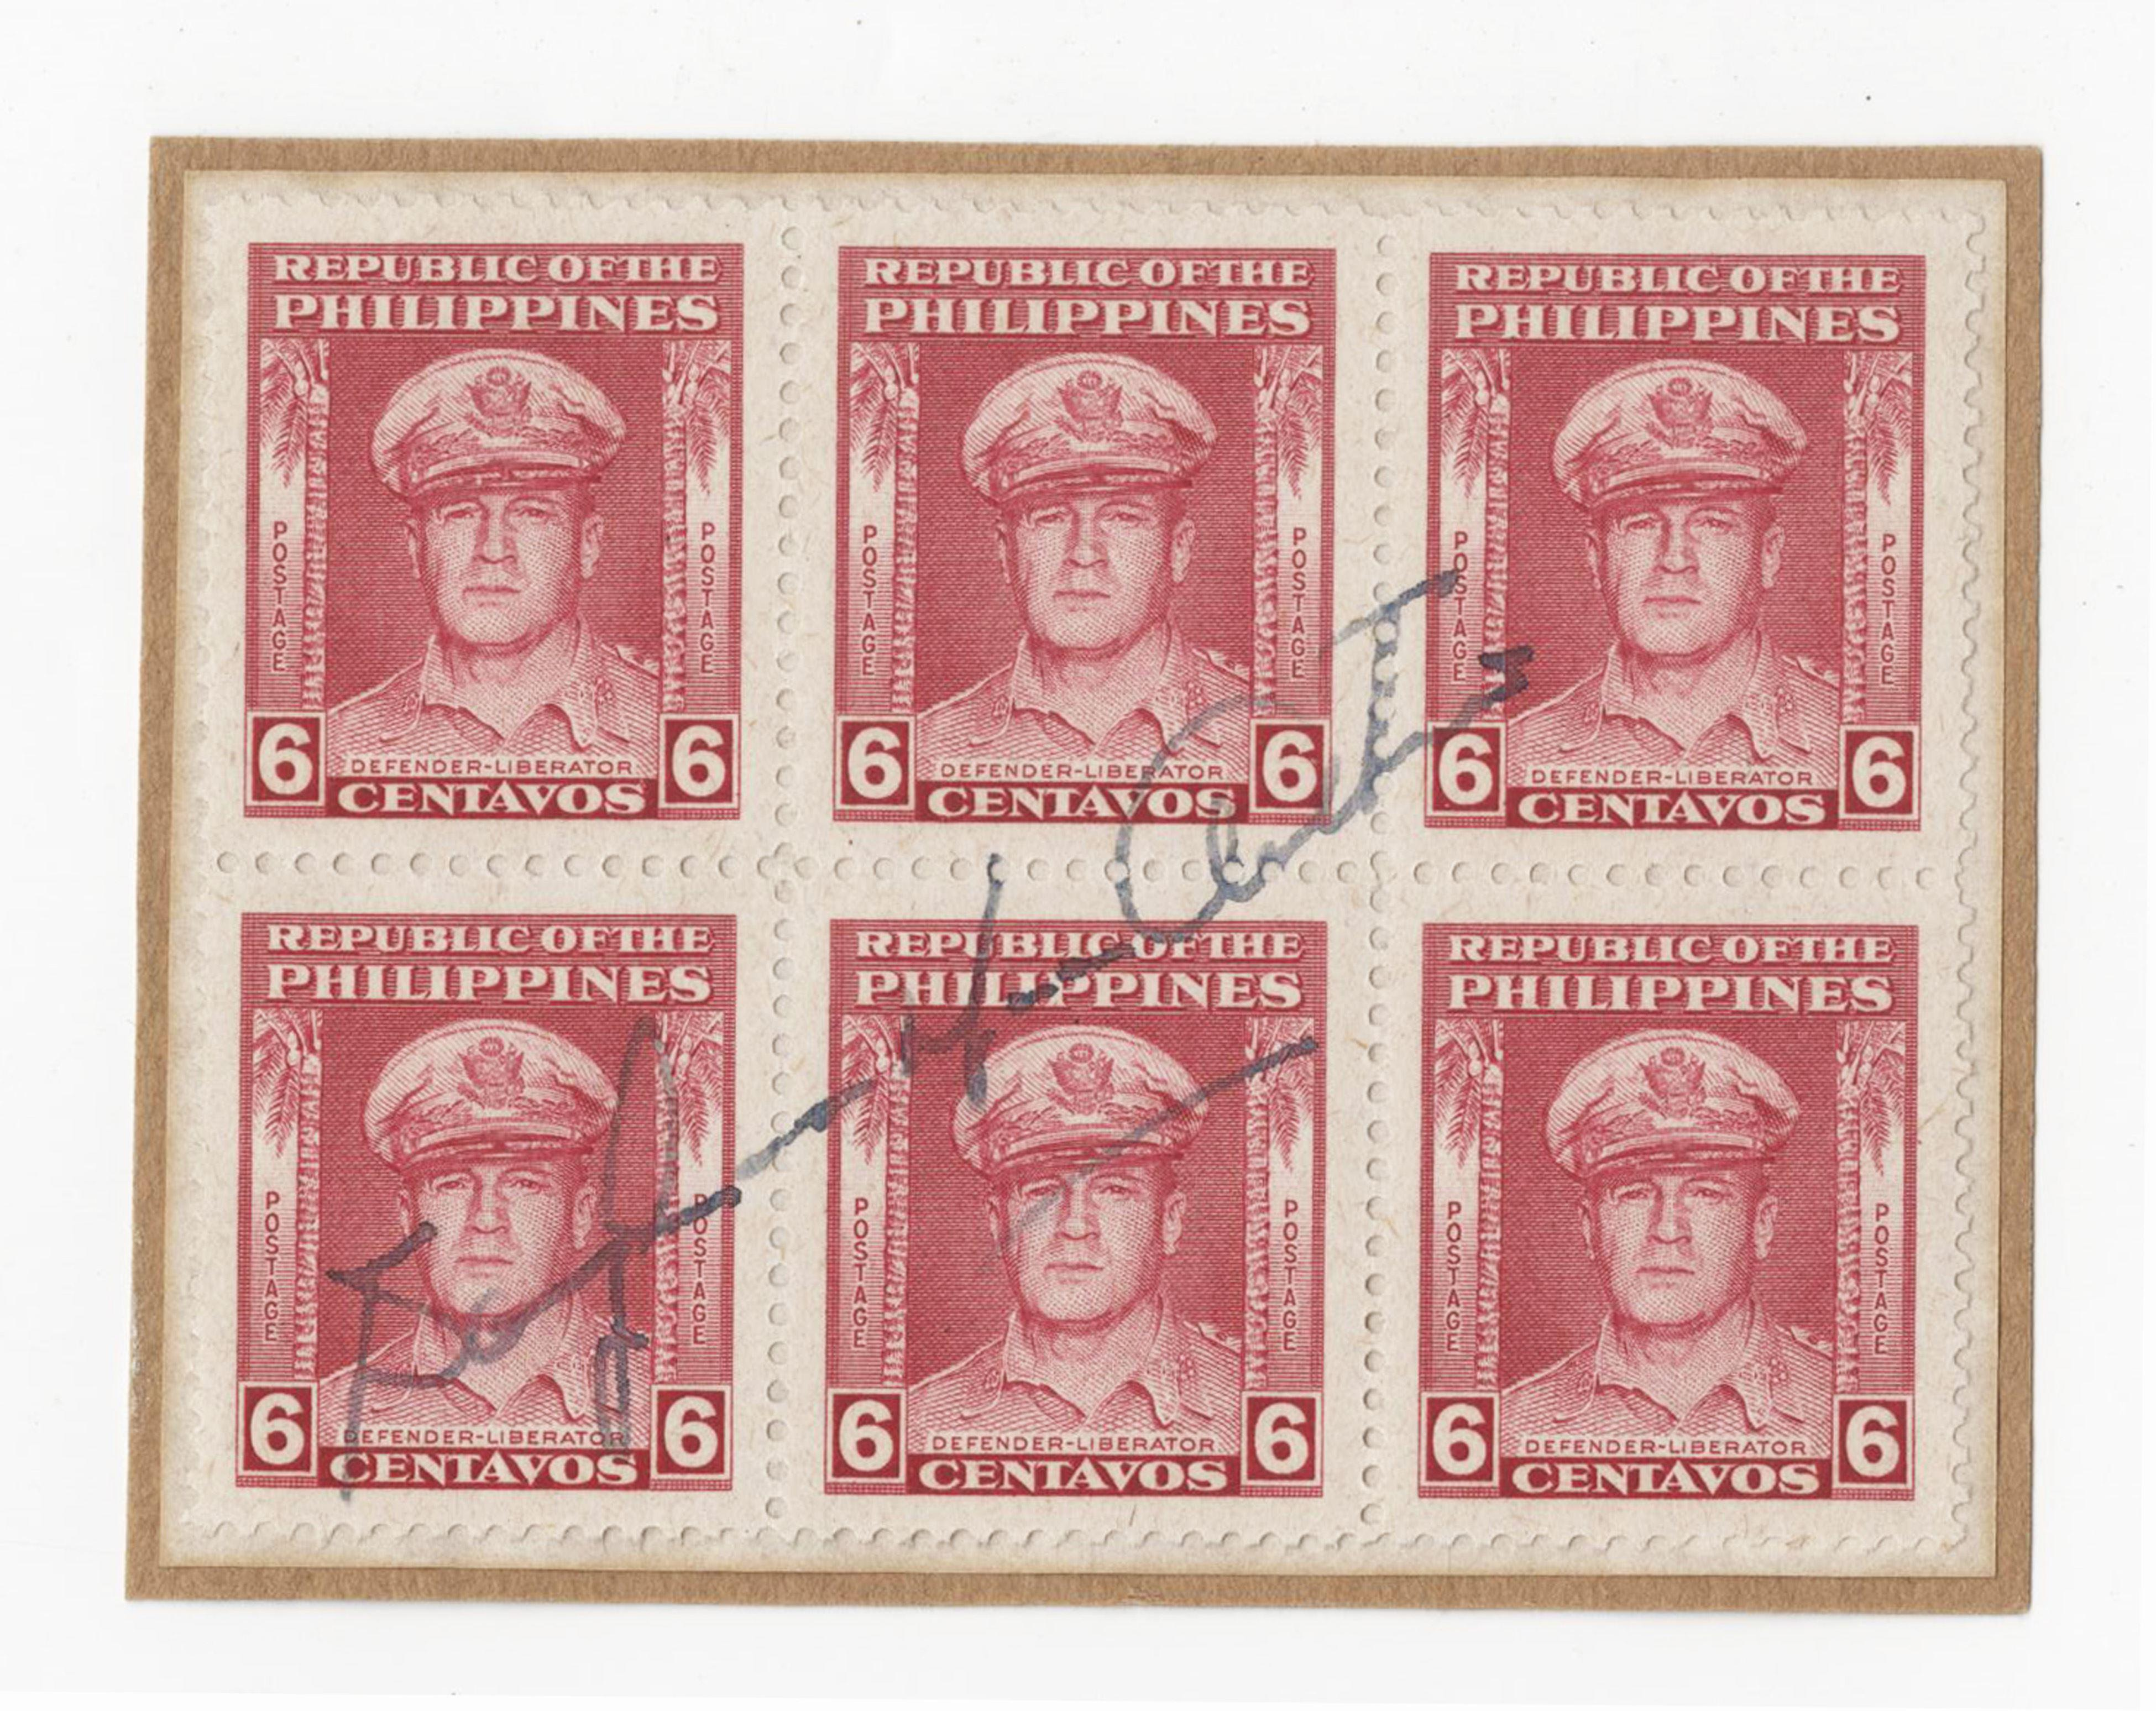 Douglas MacArthur Signed Stamps